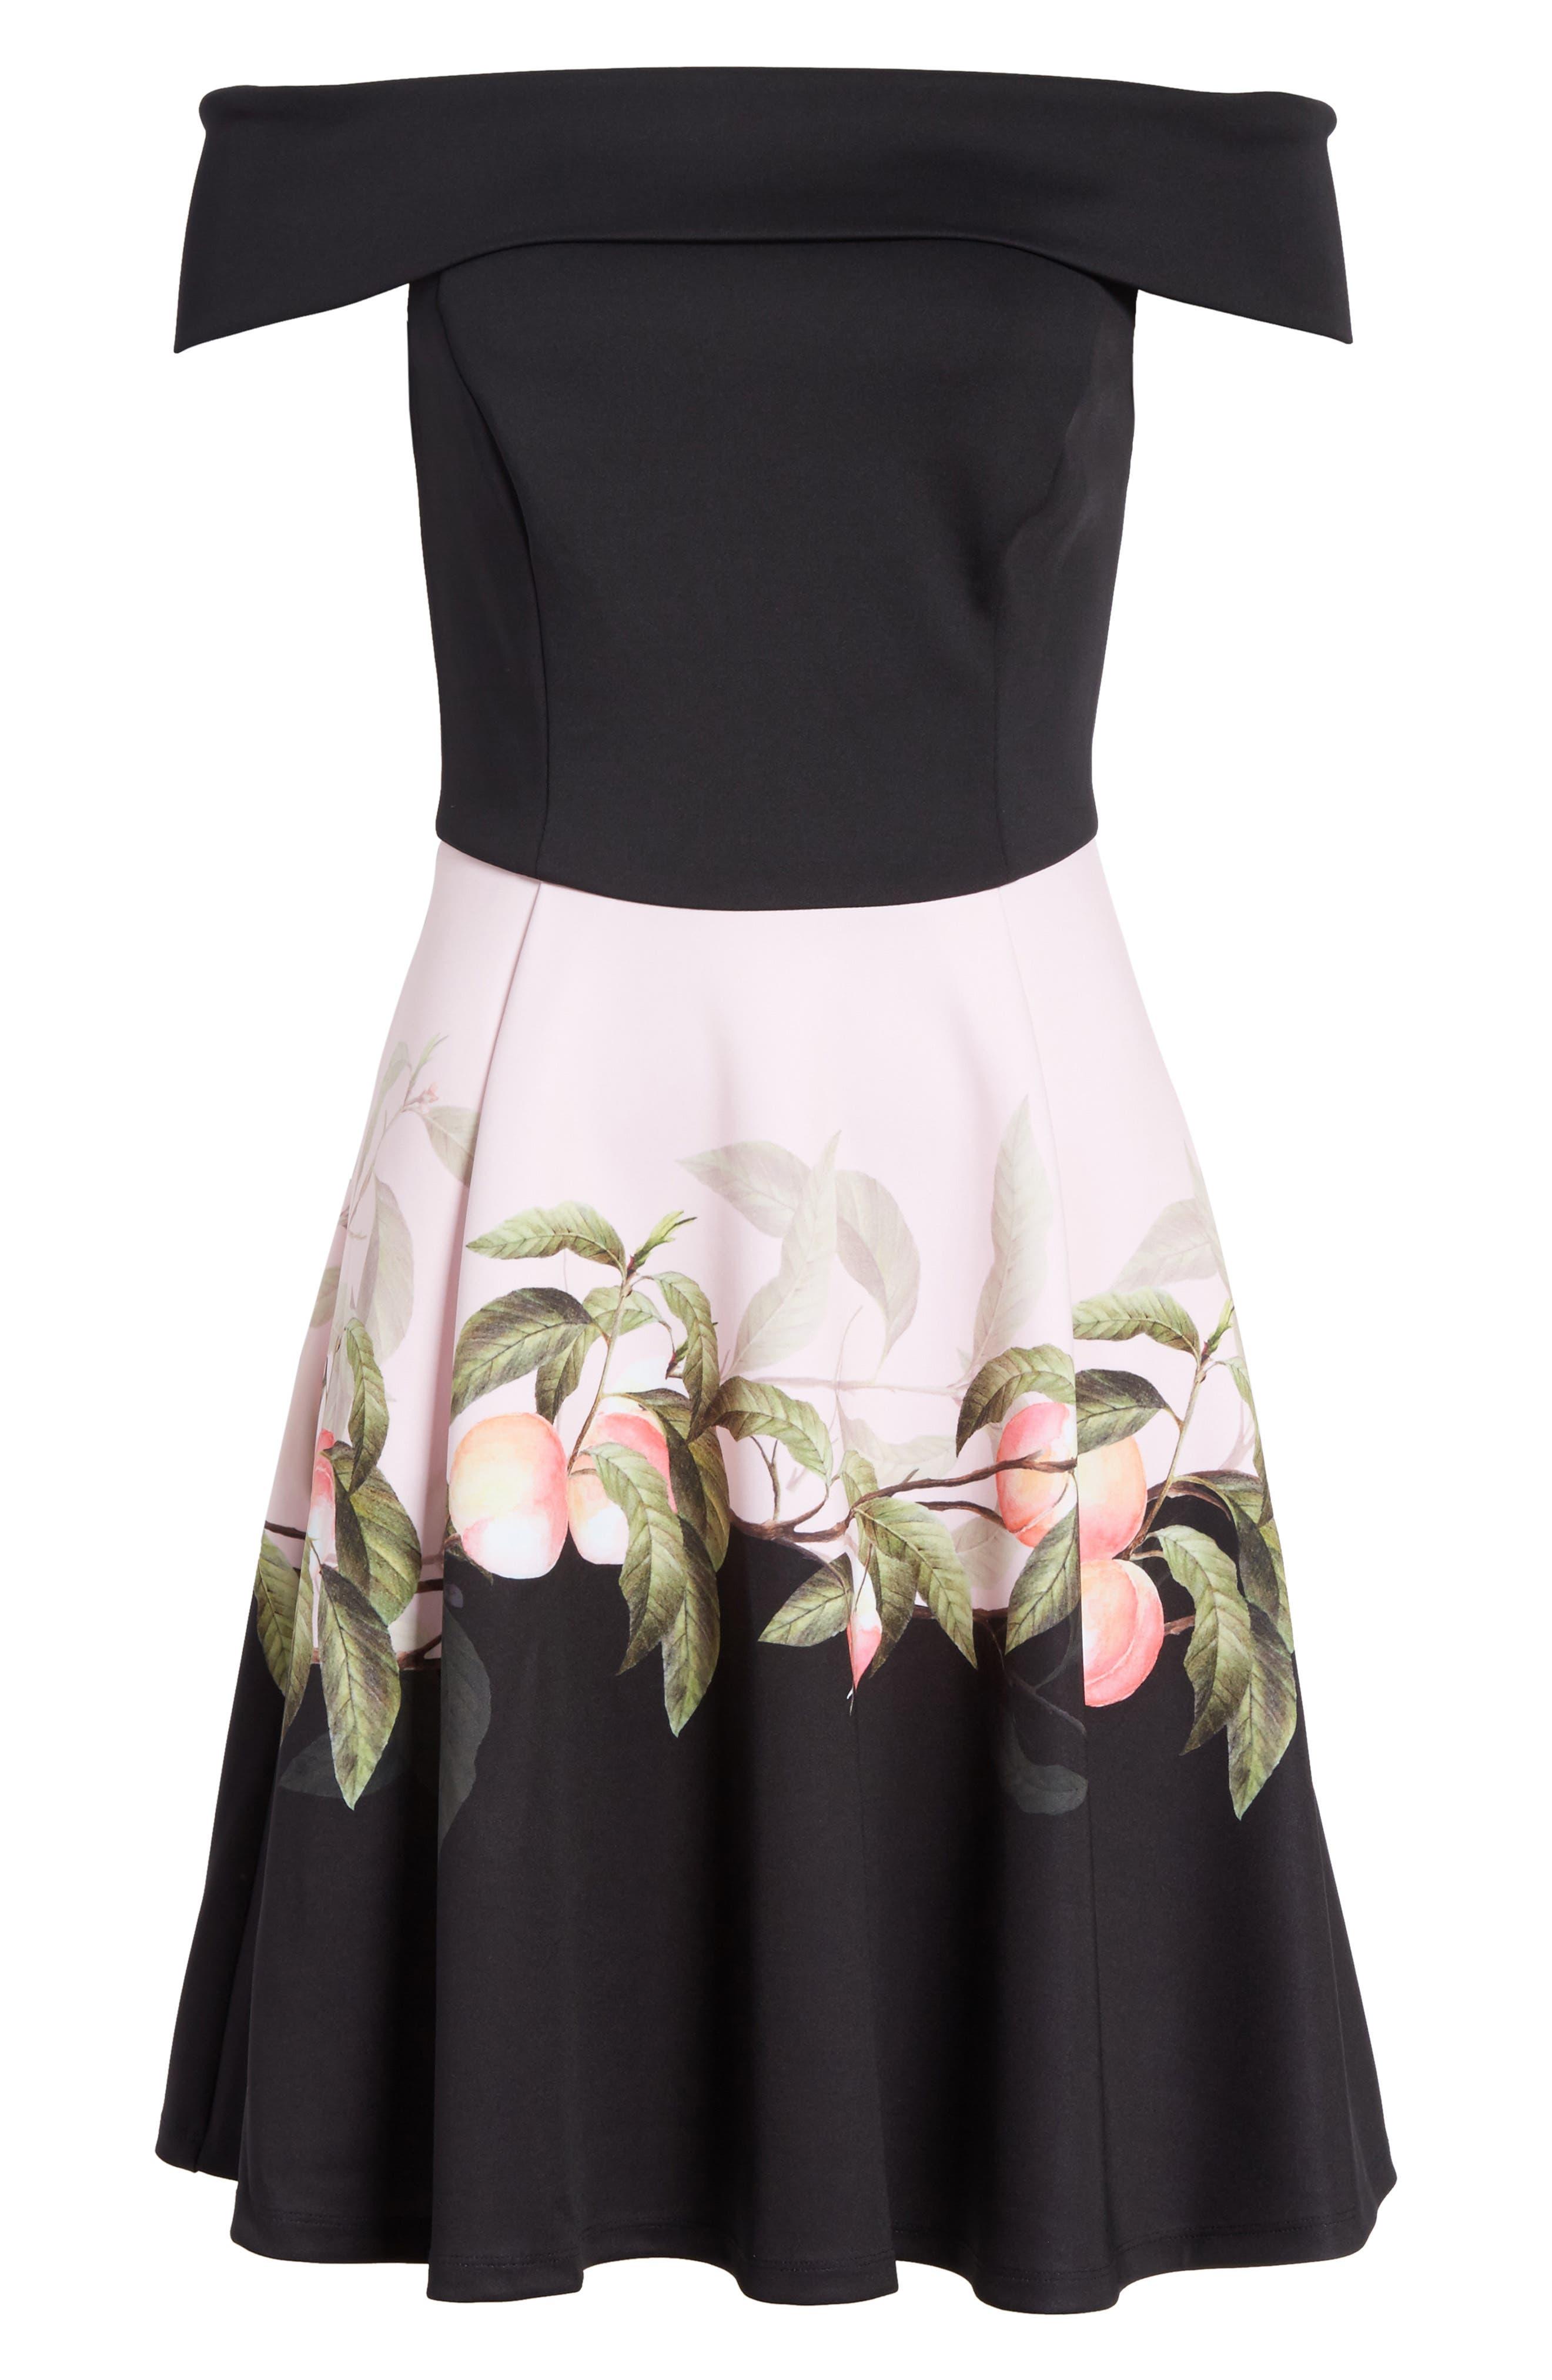 Peach Blossom Off the Shoulder Dress,                             Alternate thumbnail 6, color,                             Black